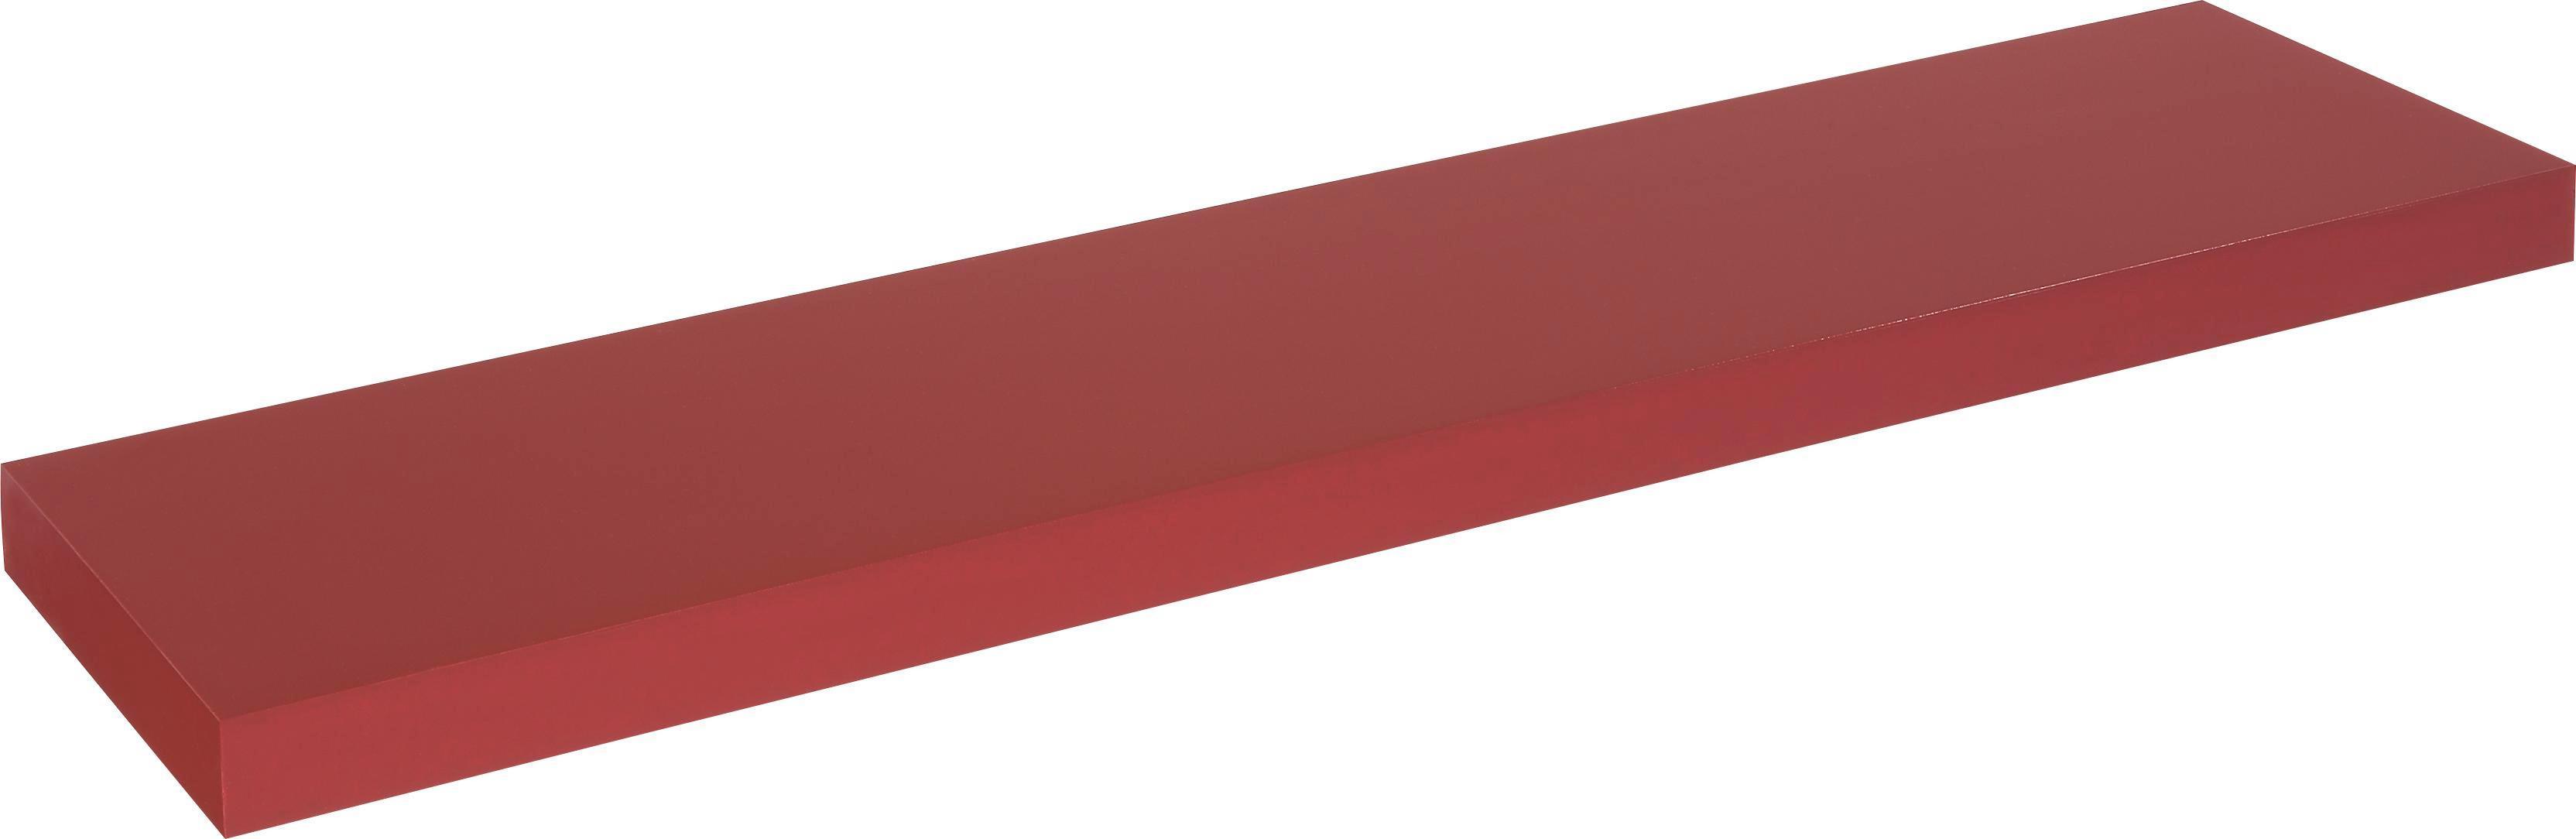 Stenska Polica Anja - rdeča, leseni material (100/4,5/24cm)